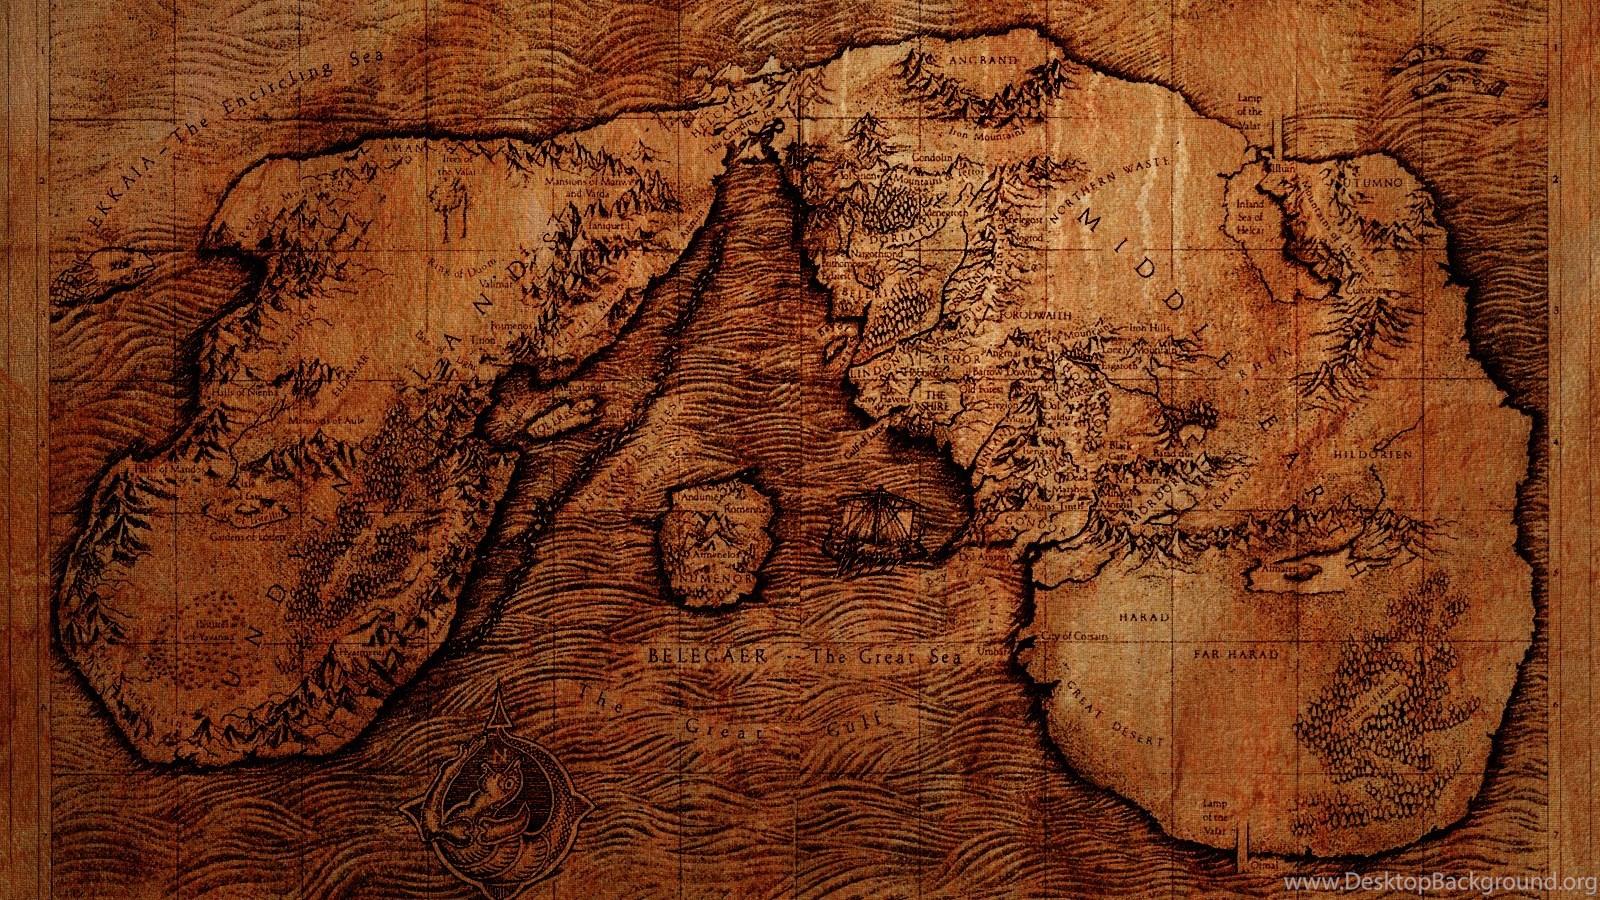 Middle Earth Map Wallpapers By Pastorgavin On Deviantart Desktop